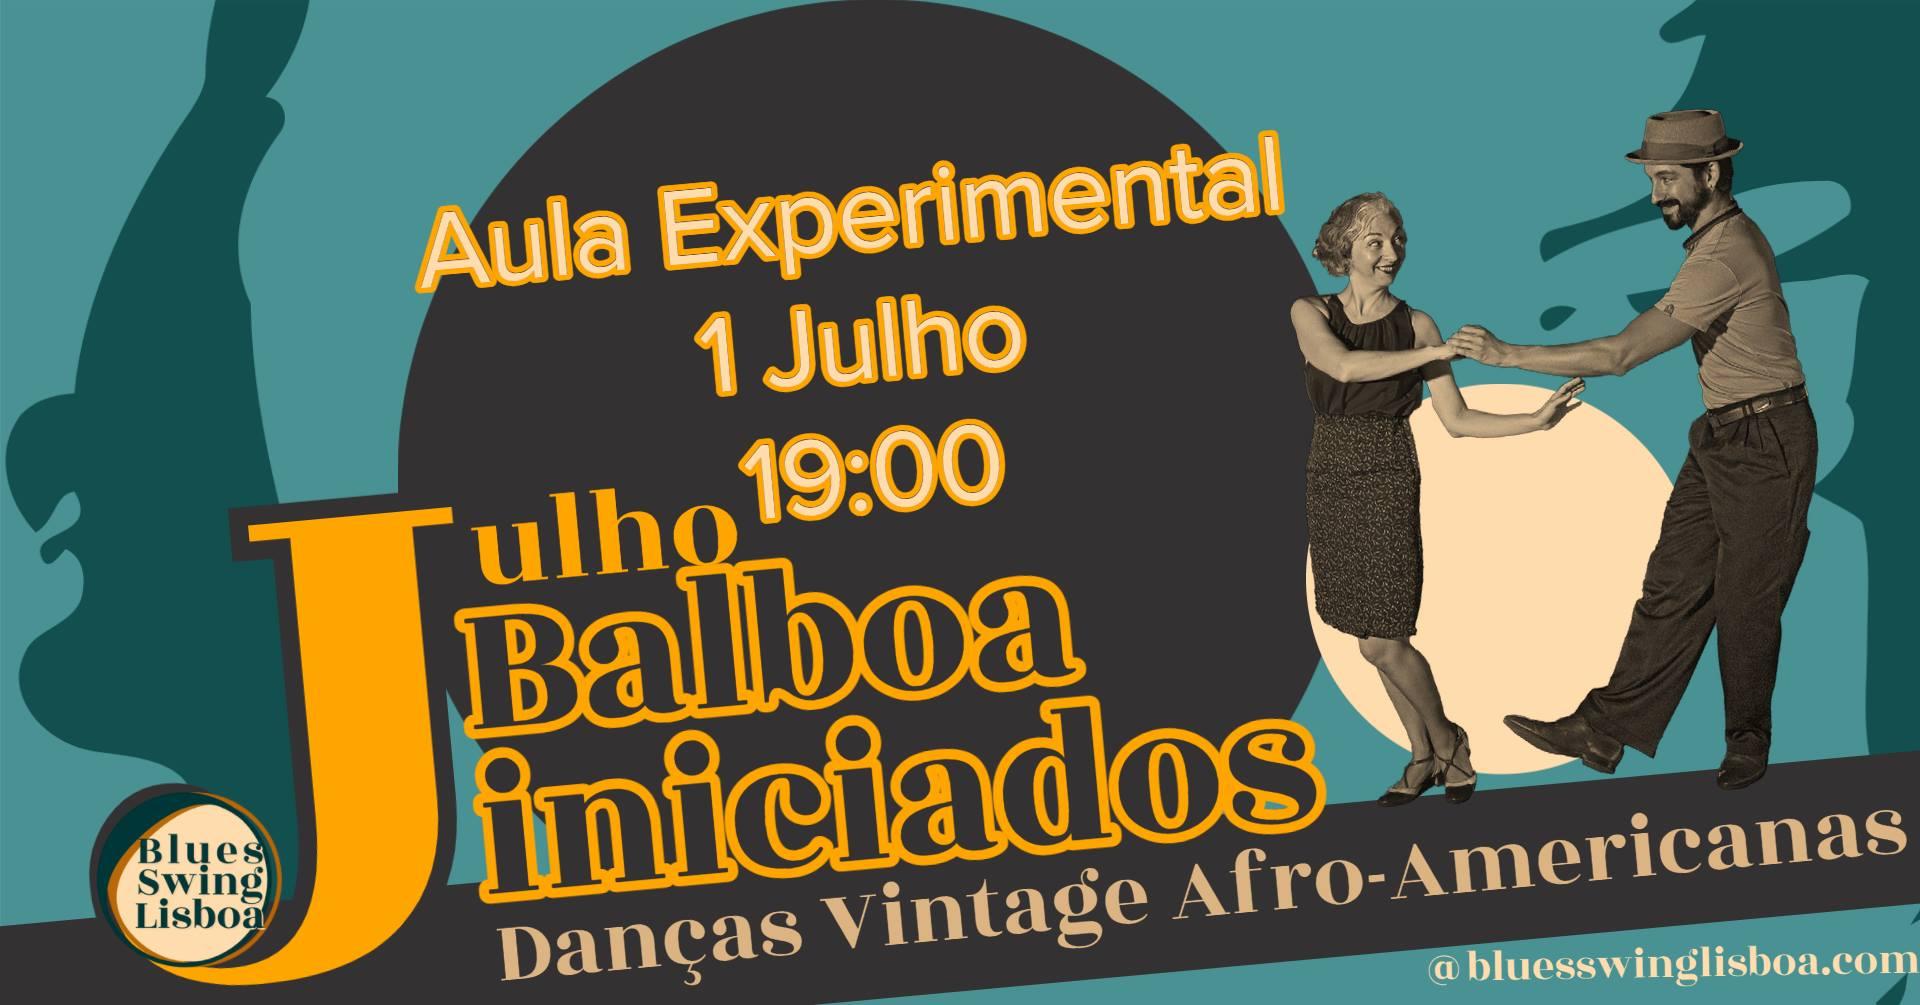 Balboa nova turma iniciados   Aula experimental